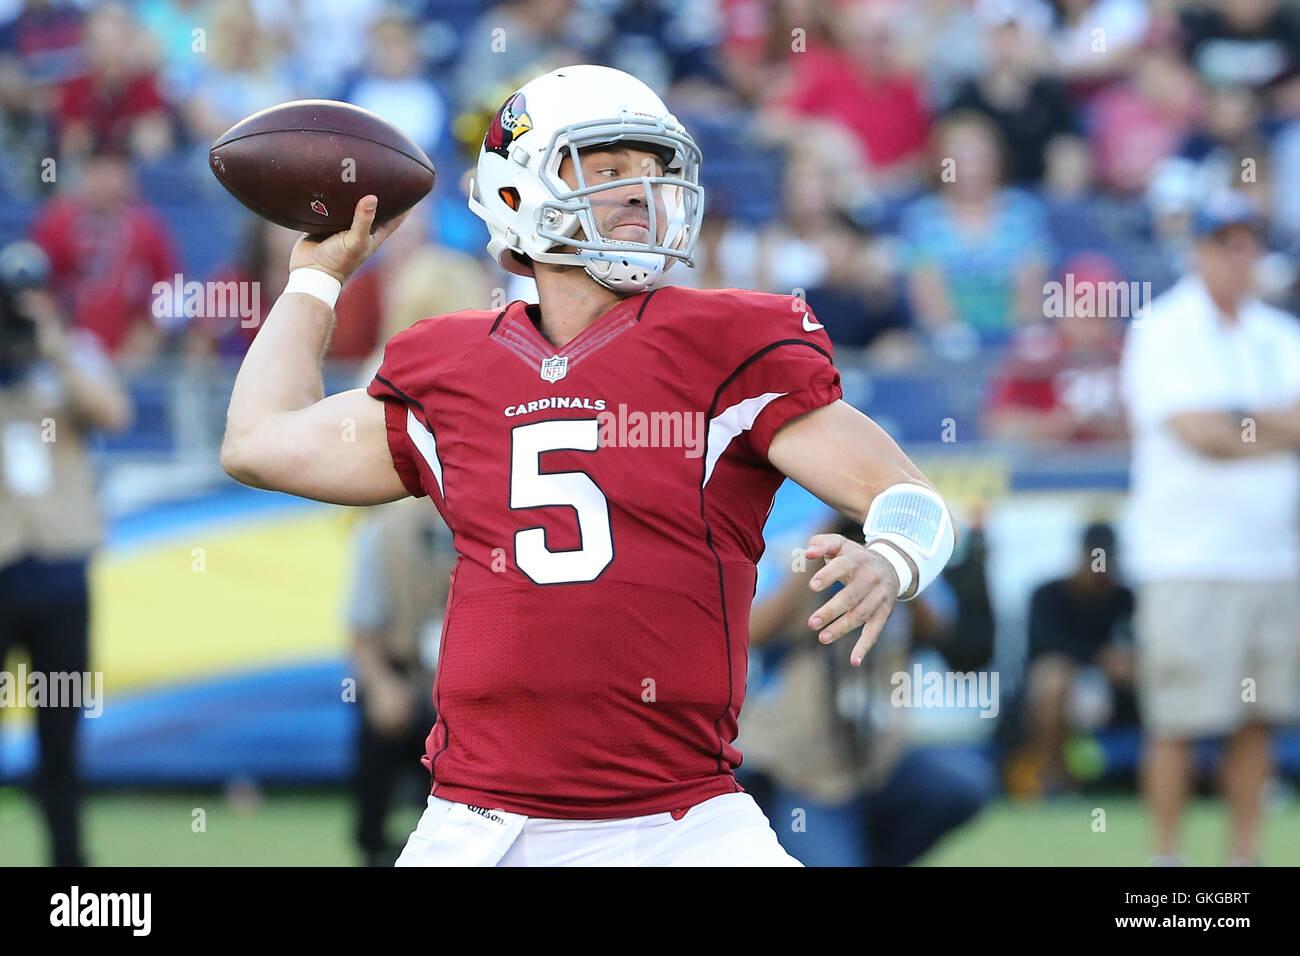 San Diego, CA, EE.UU. 19 Aug, 2016. Agosto 9, 2016: Arizona Cardinals quarterback Drew Stanton (5) se prepara para Imagen De Stock